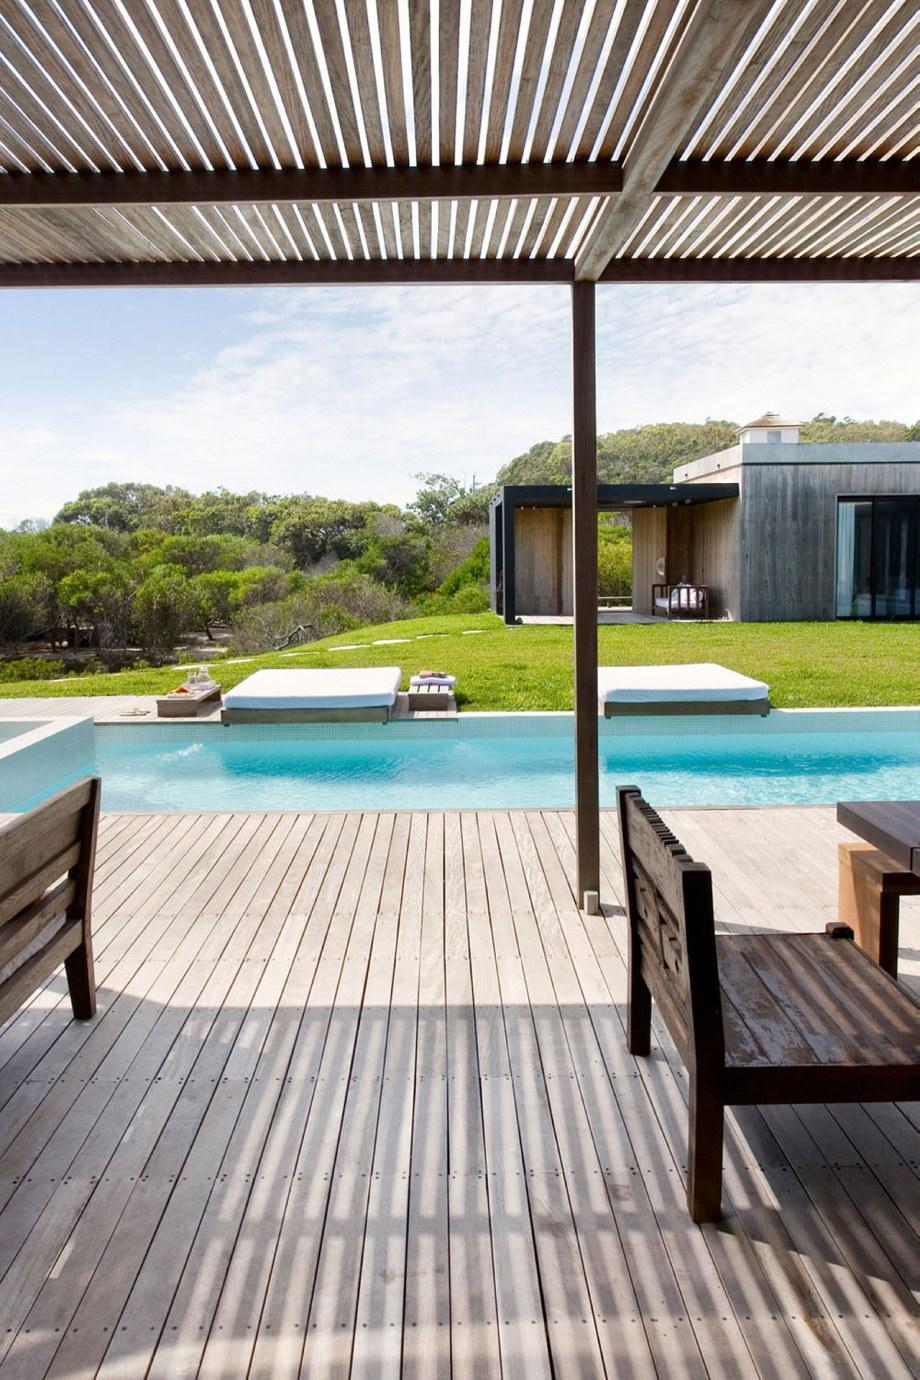 The beach house La Boyita Residence by Martin Gomez Arguitectos, Uruguay 10